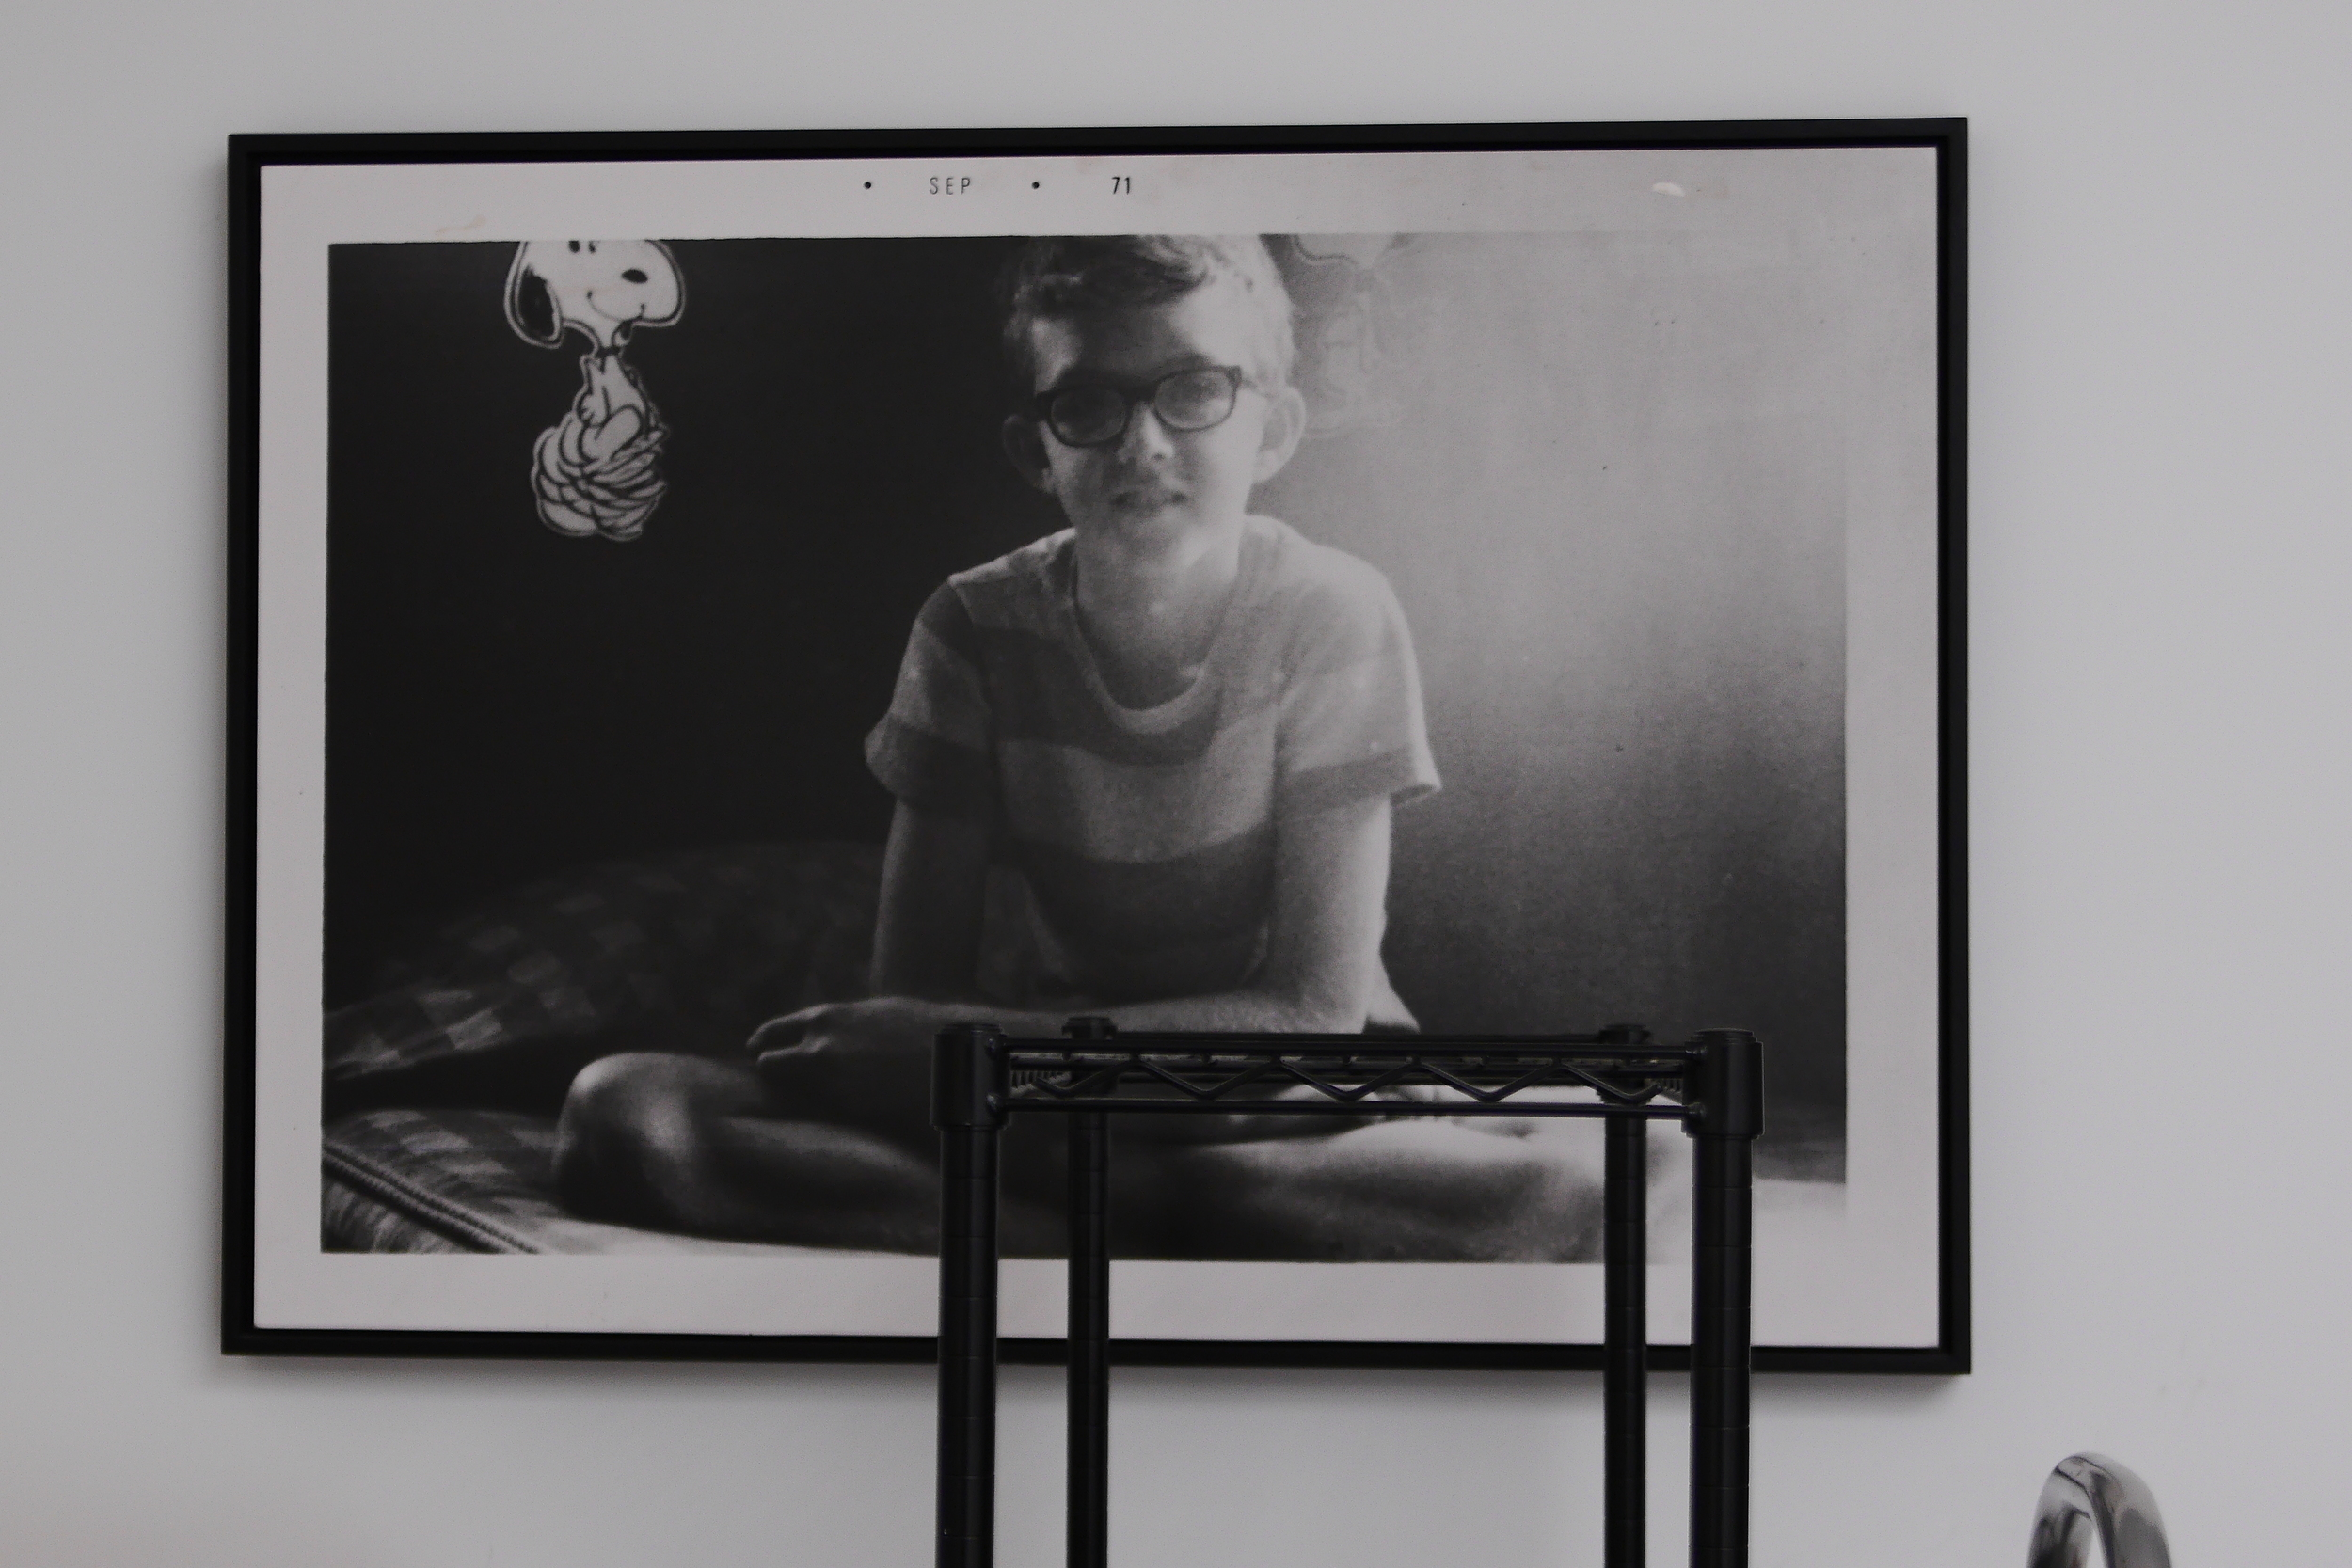 Maria-Brito_Keith-Haring-Foundation-6.jpg